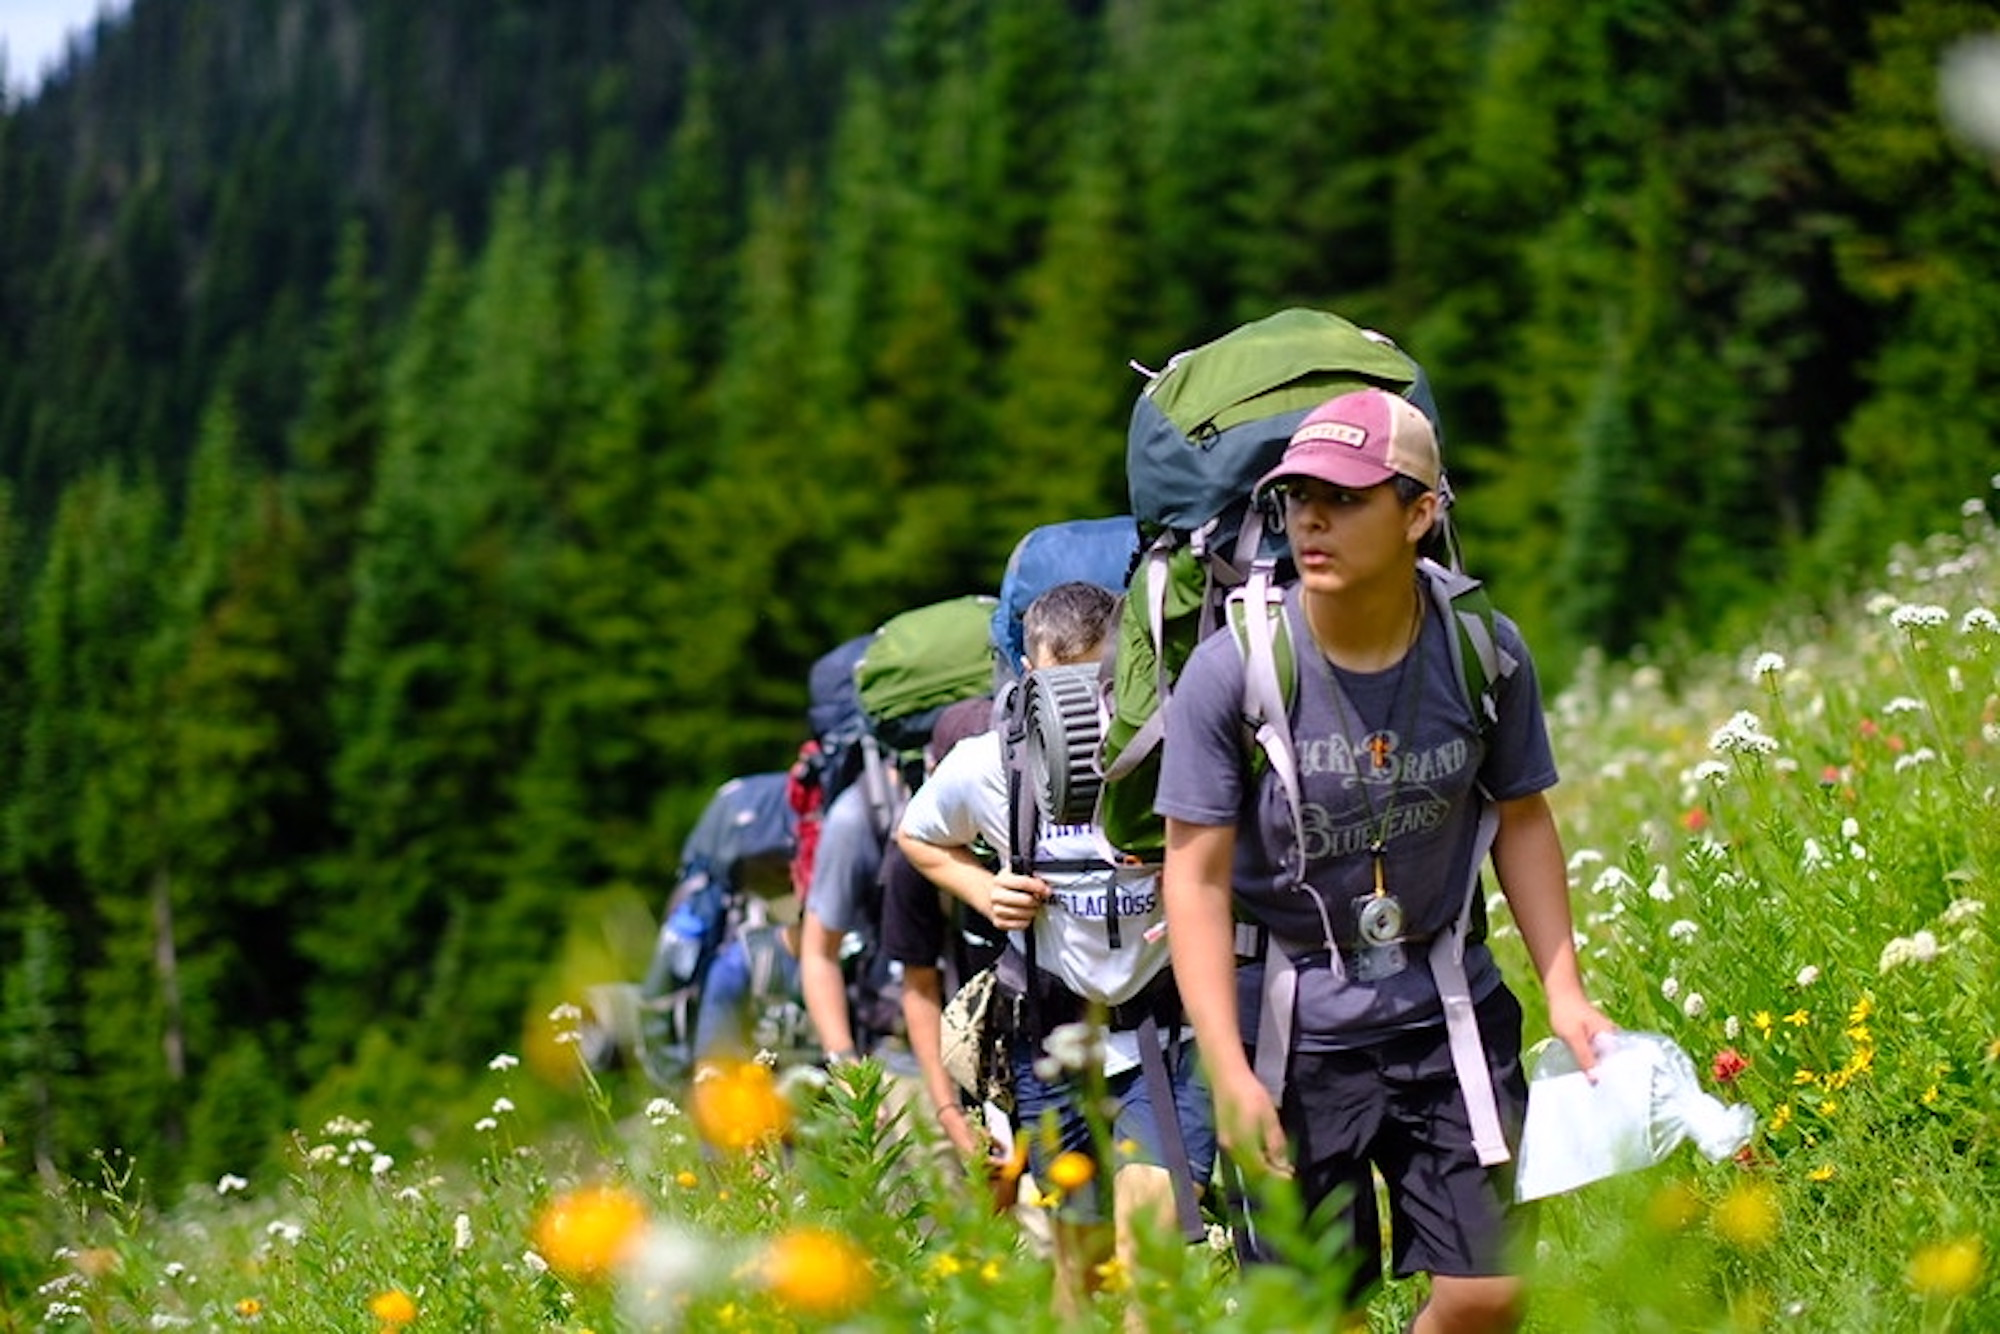 Big City Mountaineers program hiking